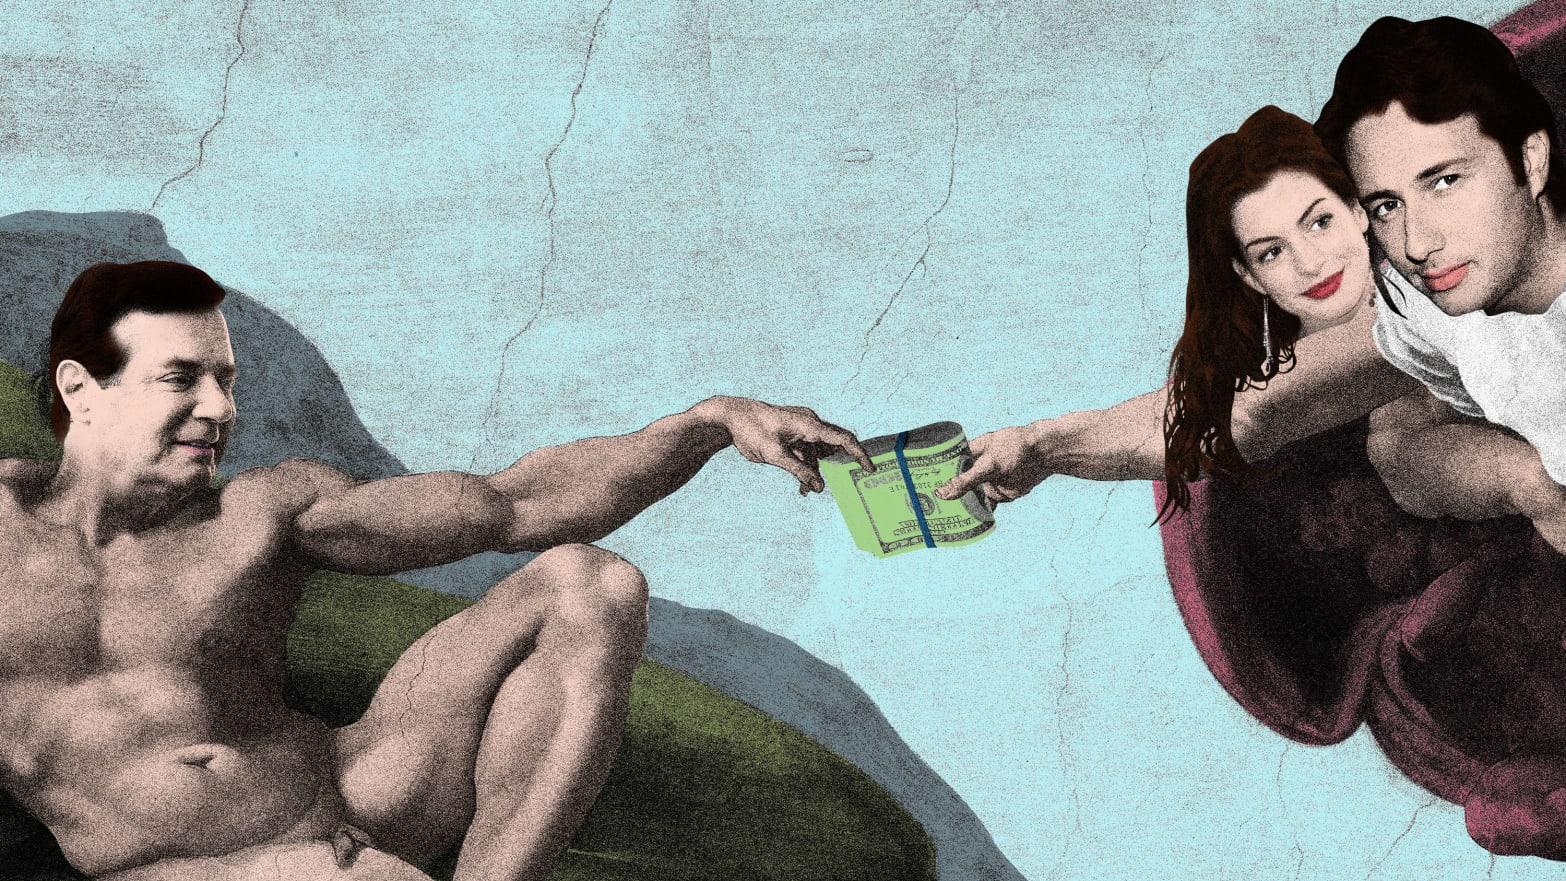 Paul Manafort, Rick Davis, Anne Hathaway's Fraudster Ex-Boyfriend Raffaello Follieri and the Vatican Land Scam